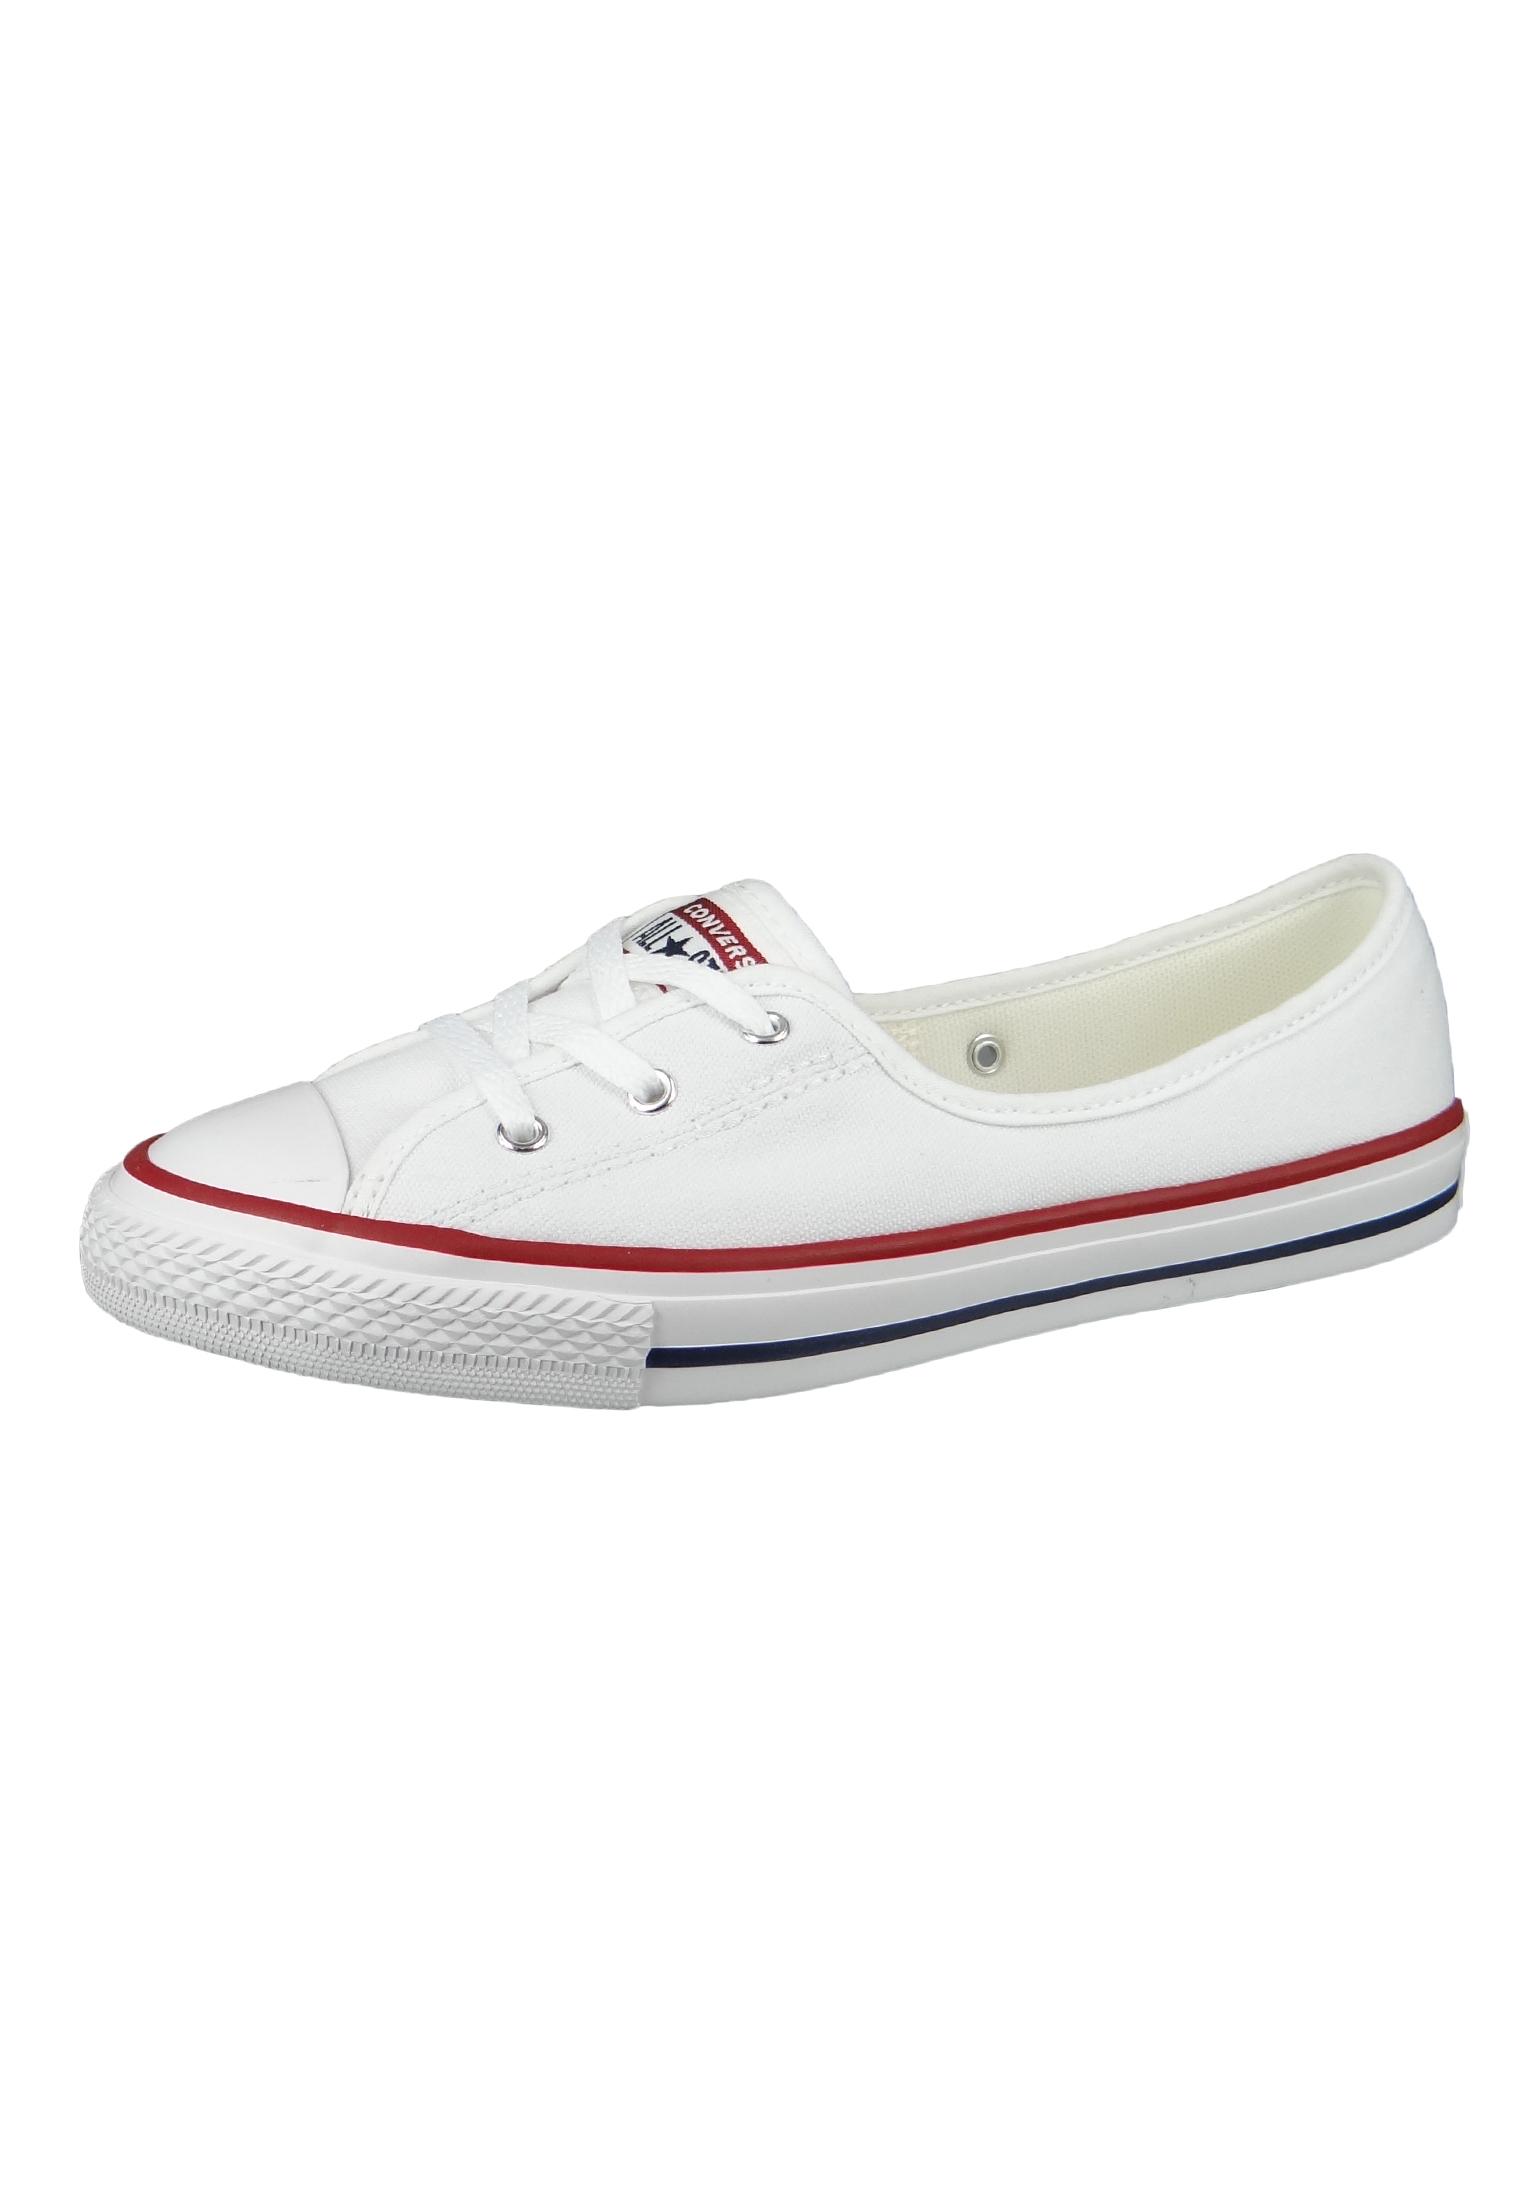 Converse Chucks 566774C Weiß Chuck Taylor All Star Ballet Lace Slip White Garnet